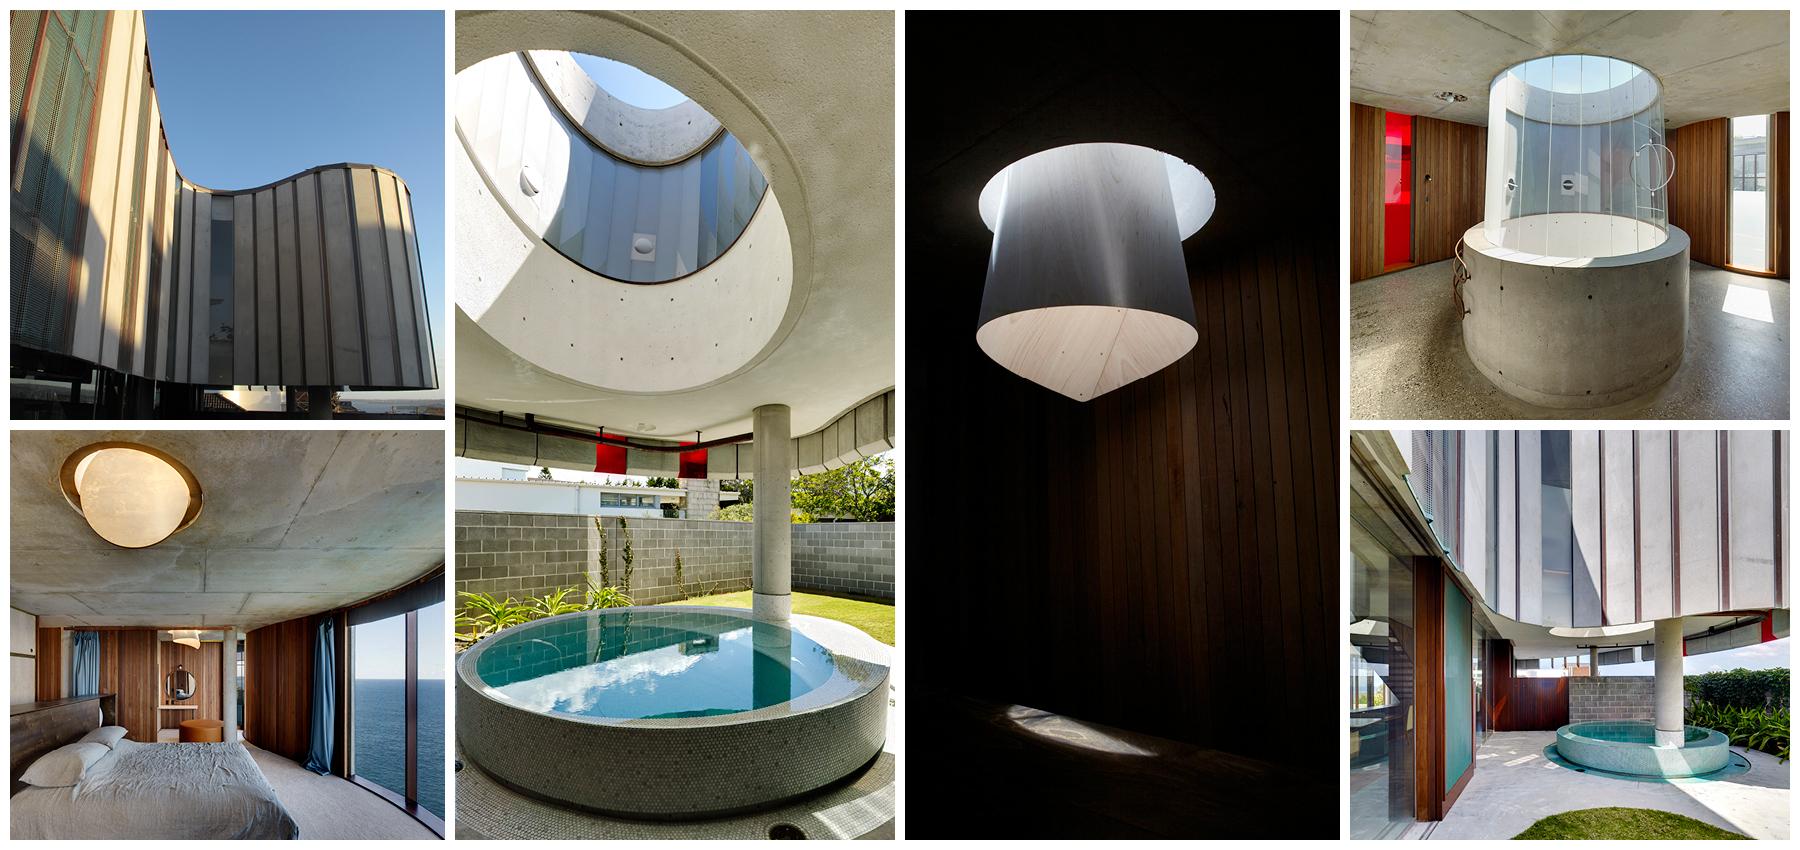 Light House by Peter Stutchbury Architecture